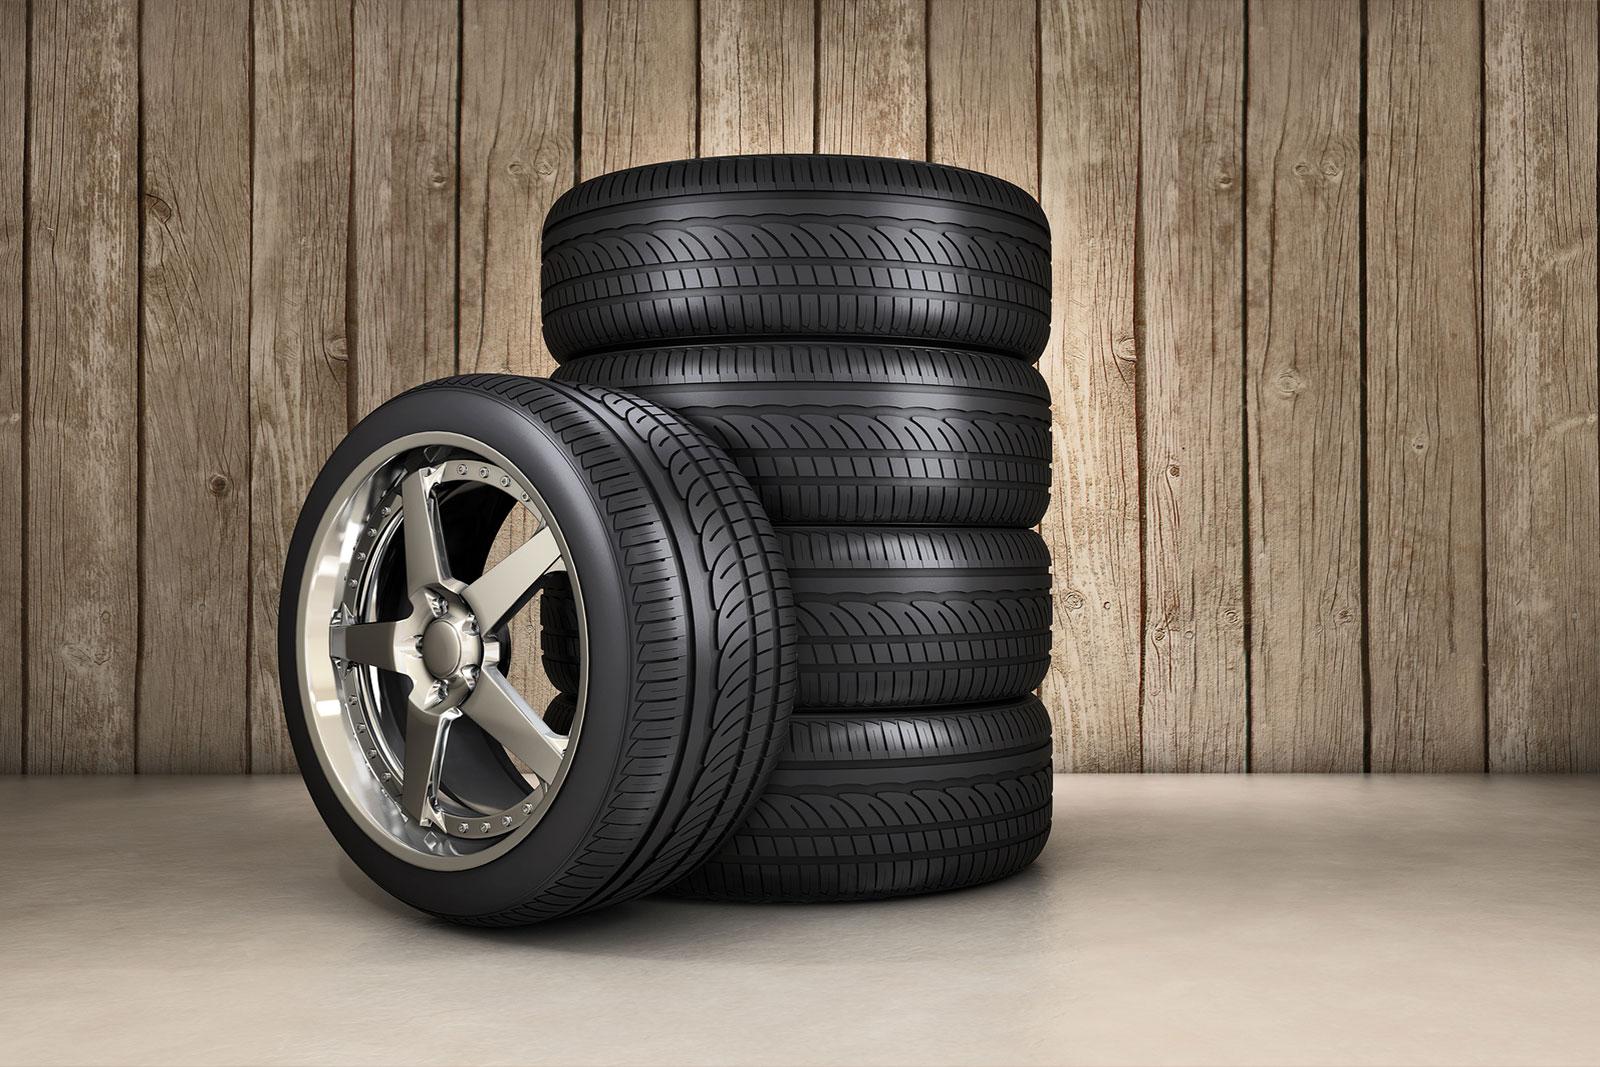 Used Rims For Sale Near Me >> C M Tires Wheels El Paso Tx Tire Shop Auto Repair